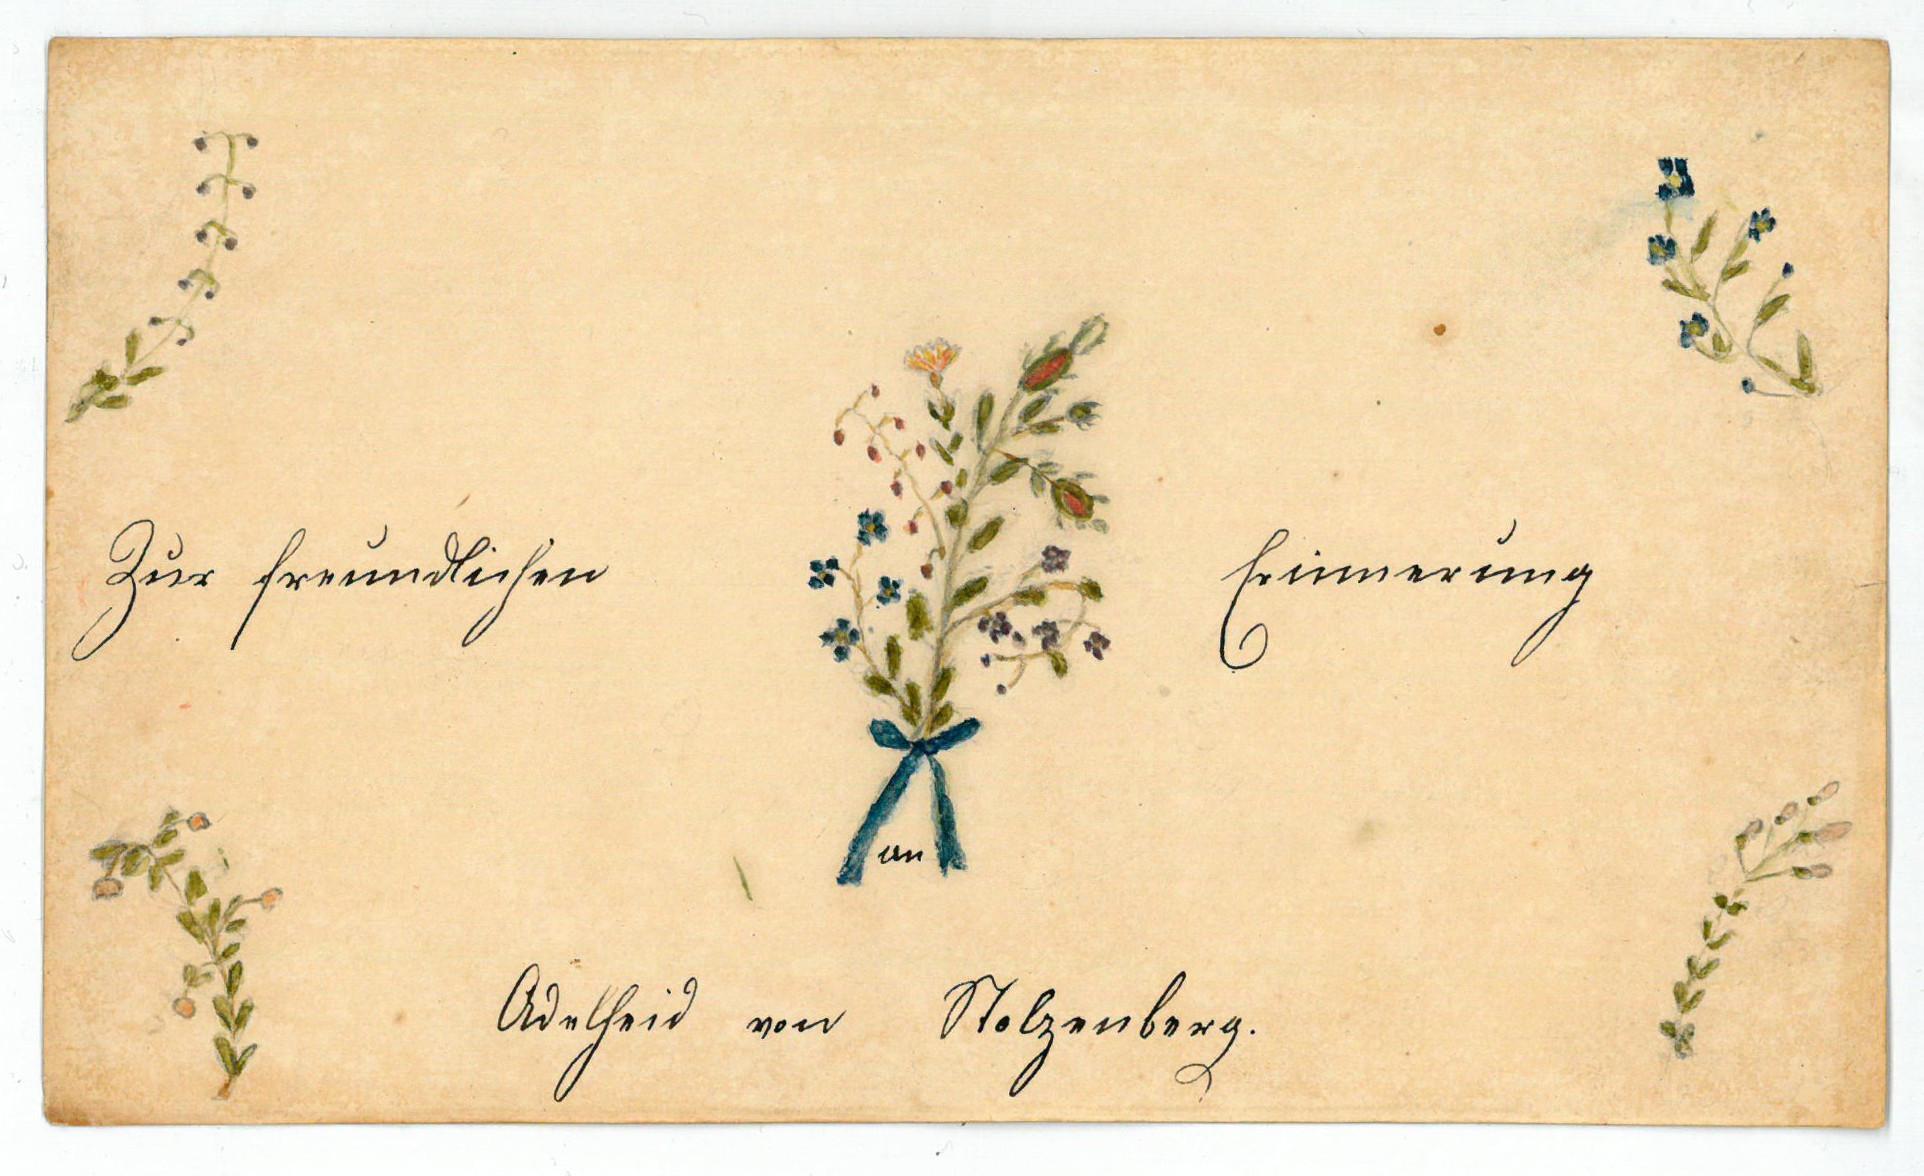 Uralgebirge Karte.Vialibri Rare Books From 1848 Page 20